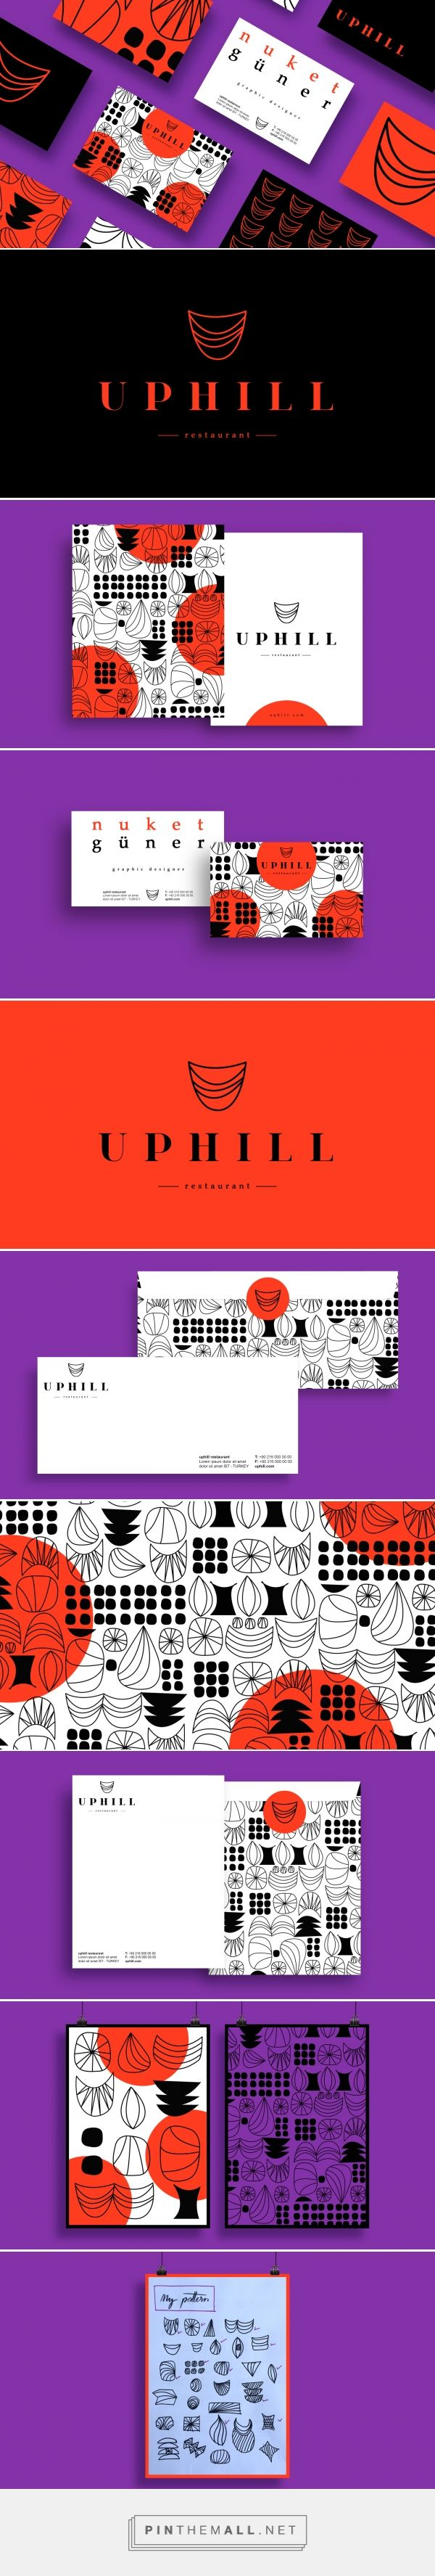 Uphill Restaurant Branding by Nuket Guner Corlan